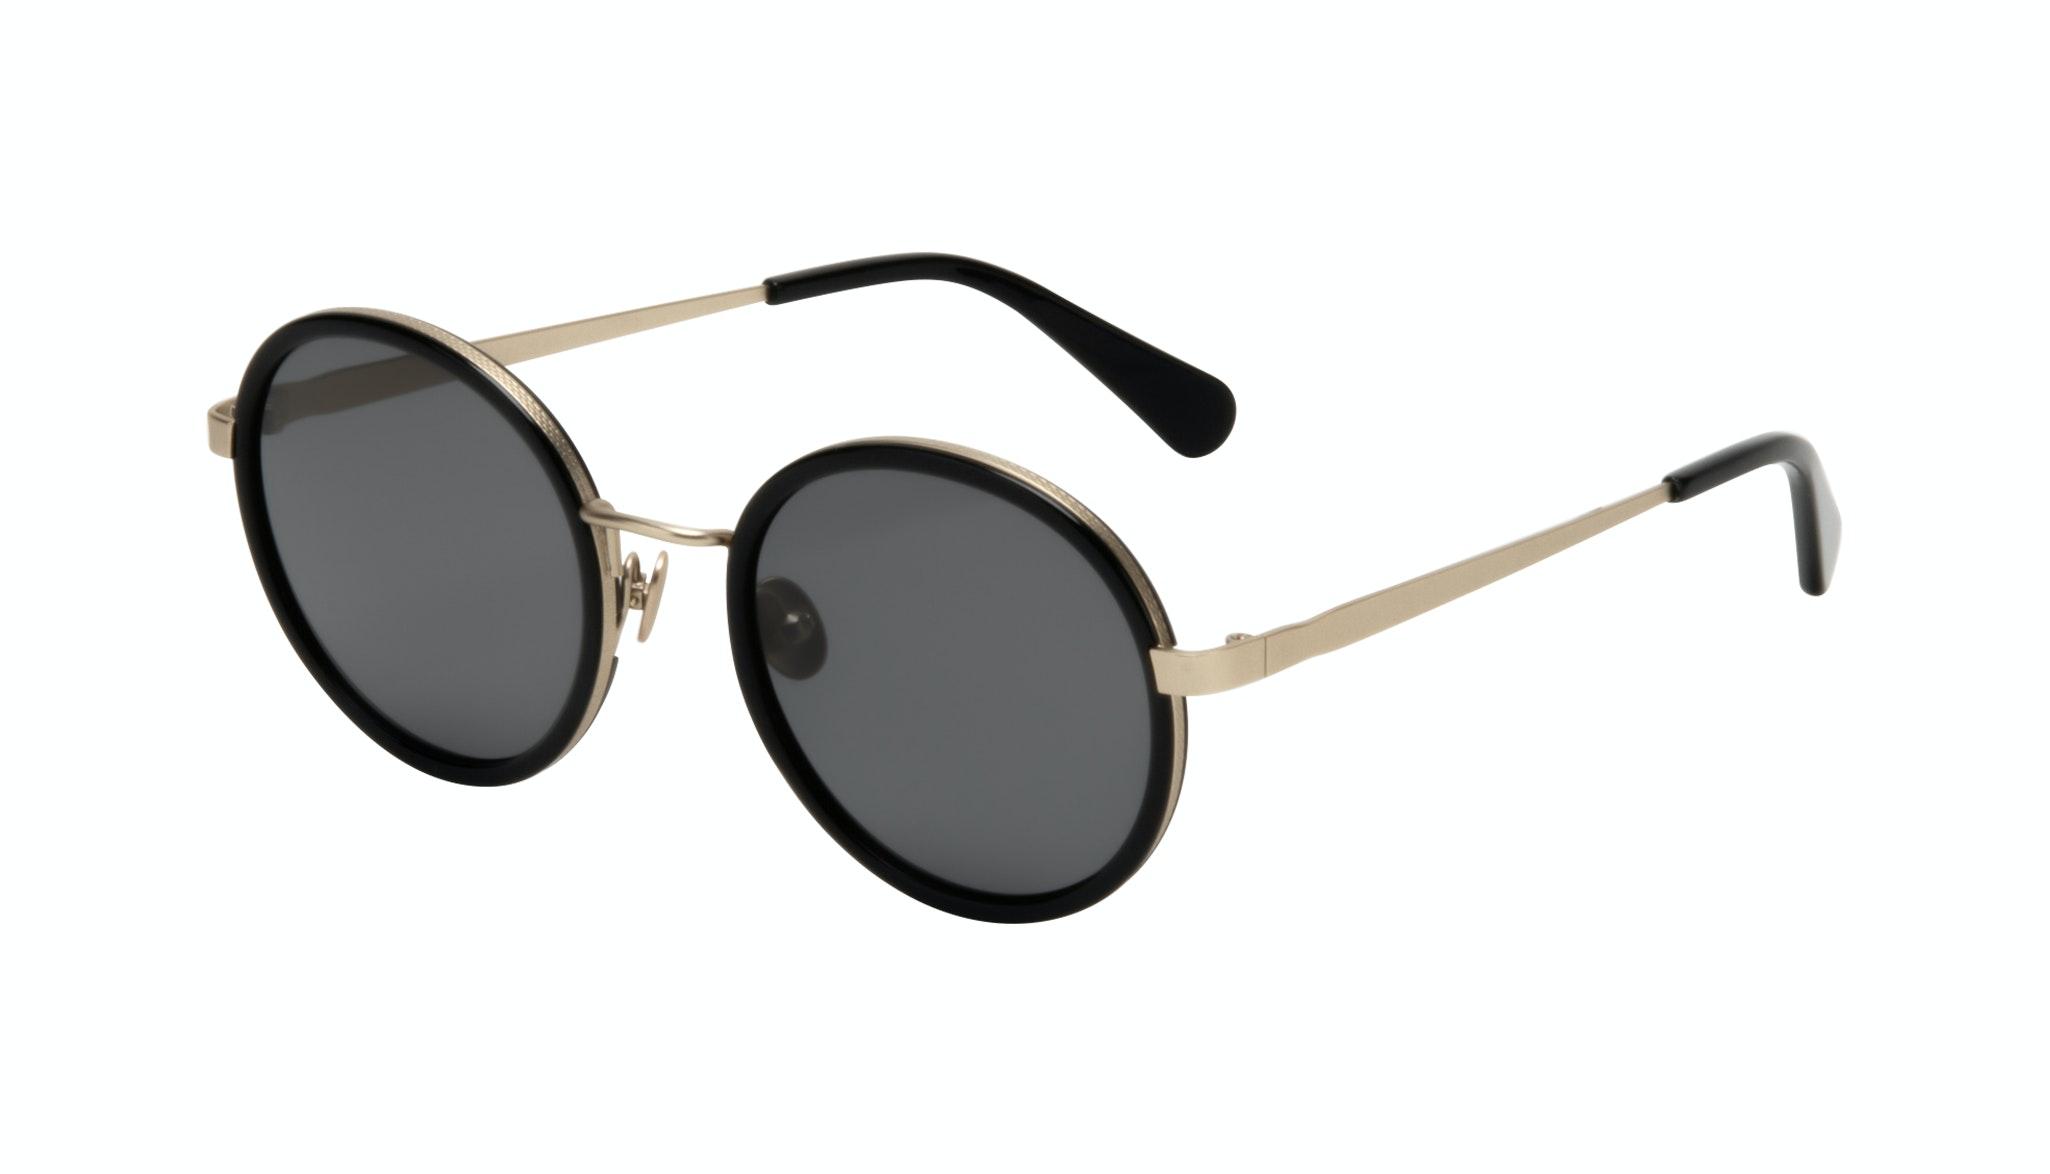 Affordable Fashion Glasses Round Sunglasses Women Boogie Onyx Tilt